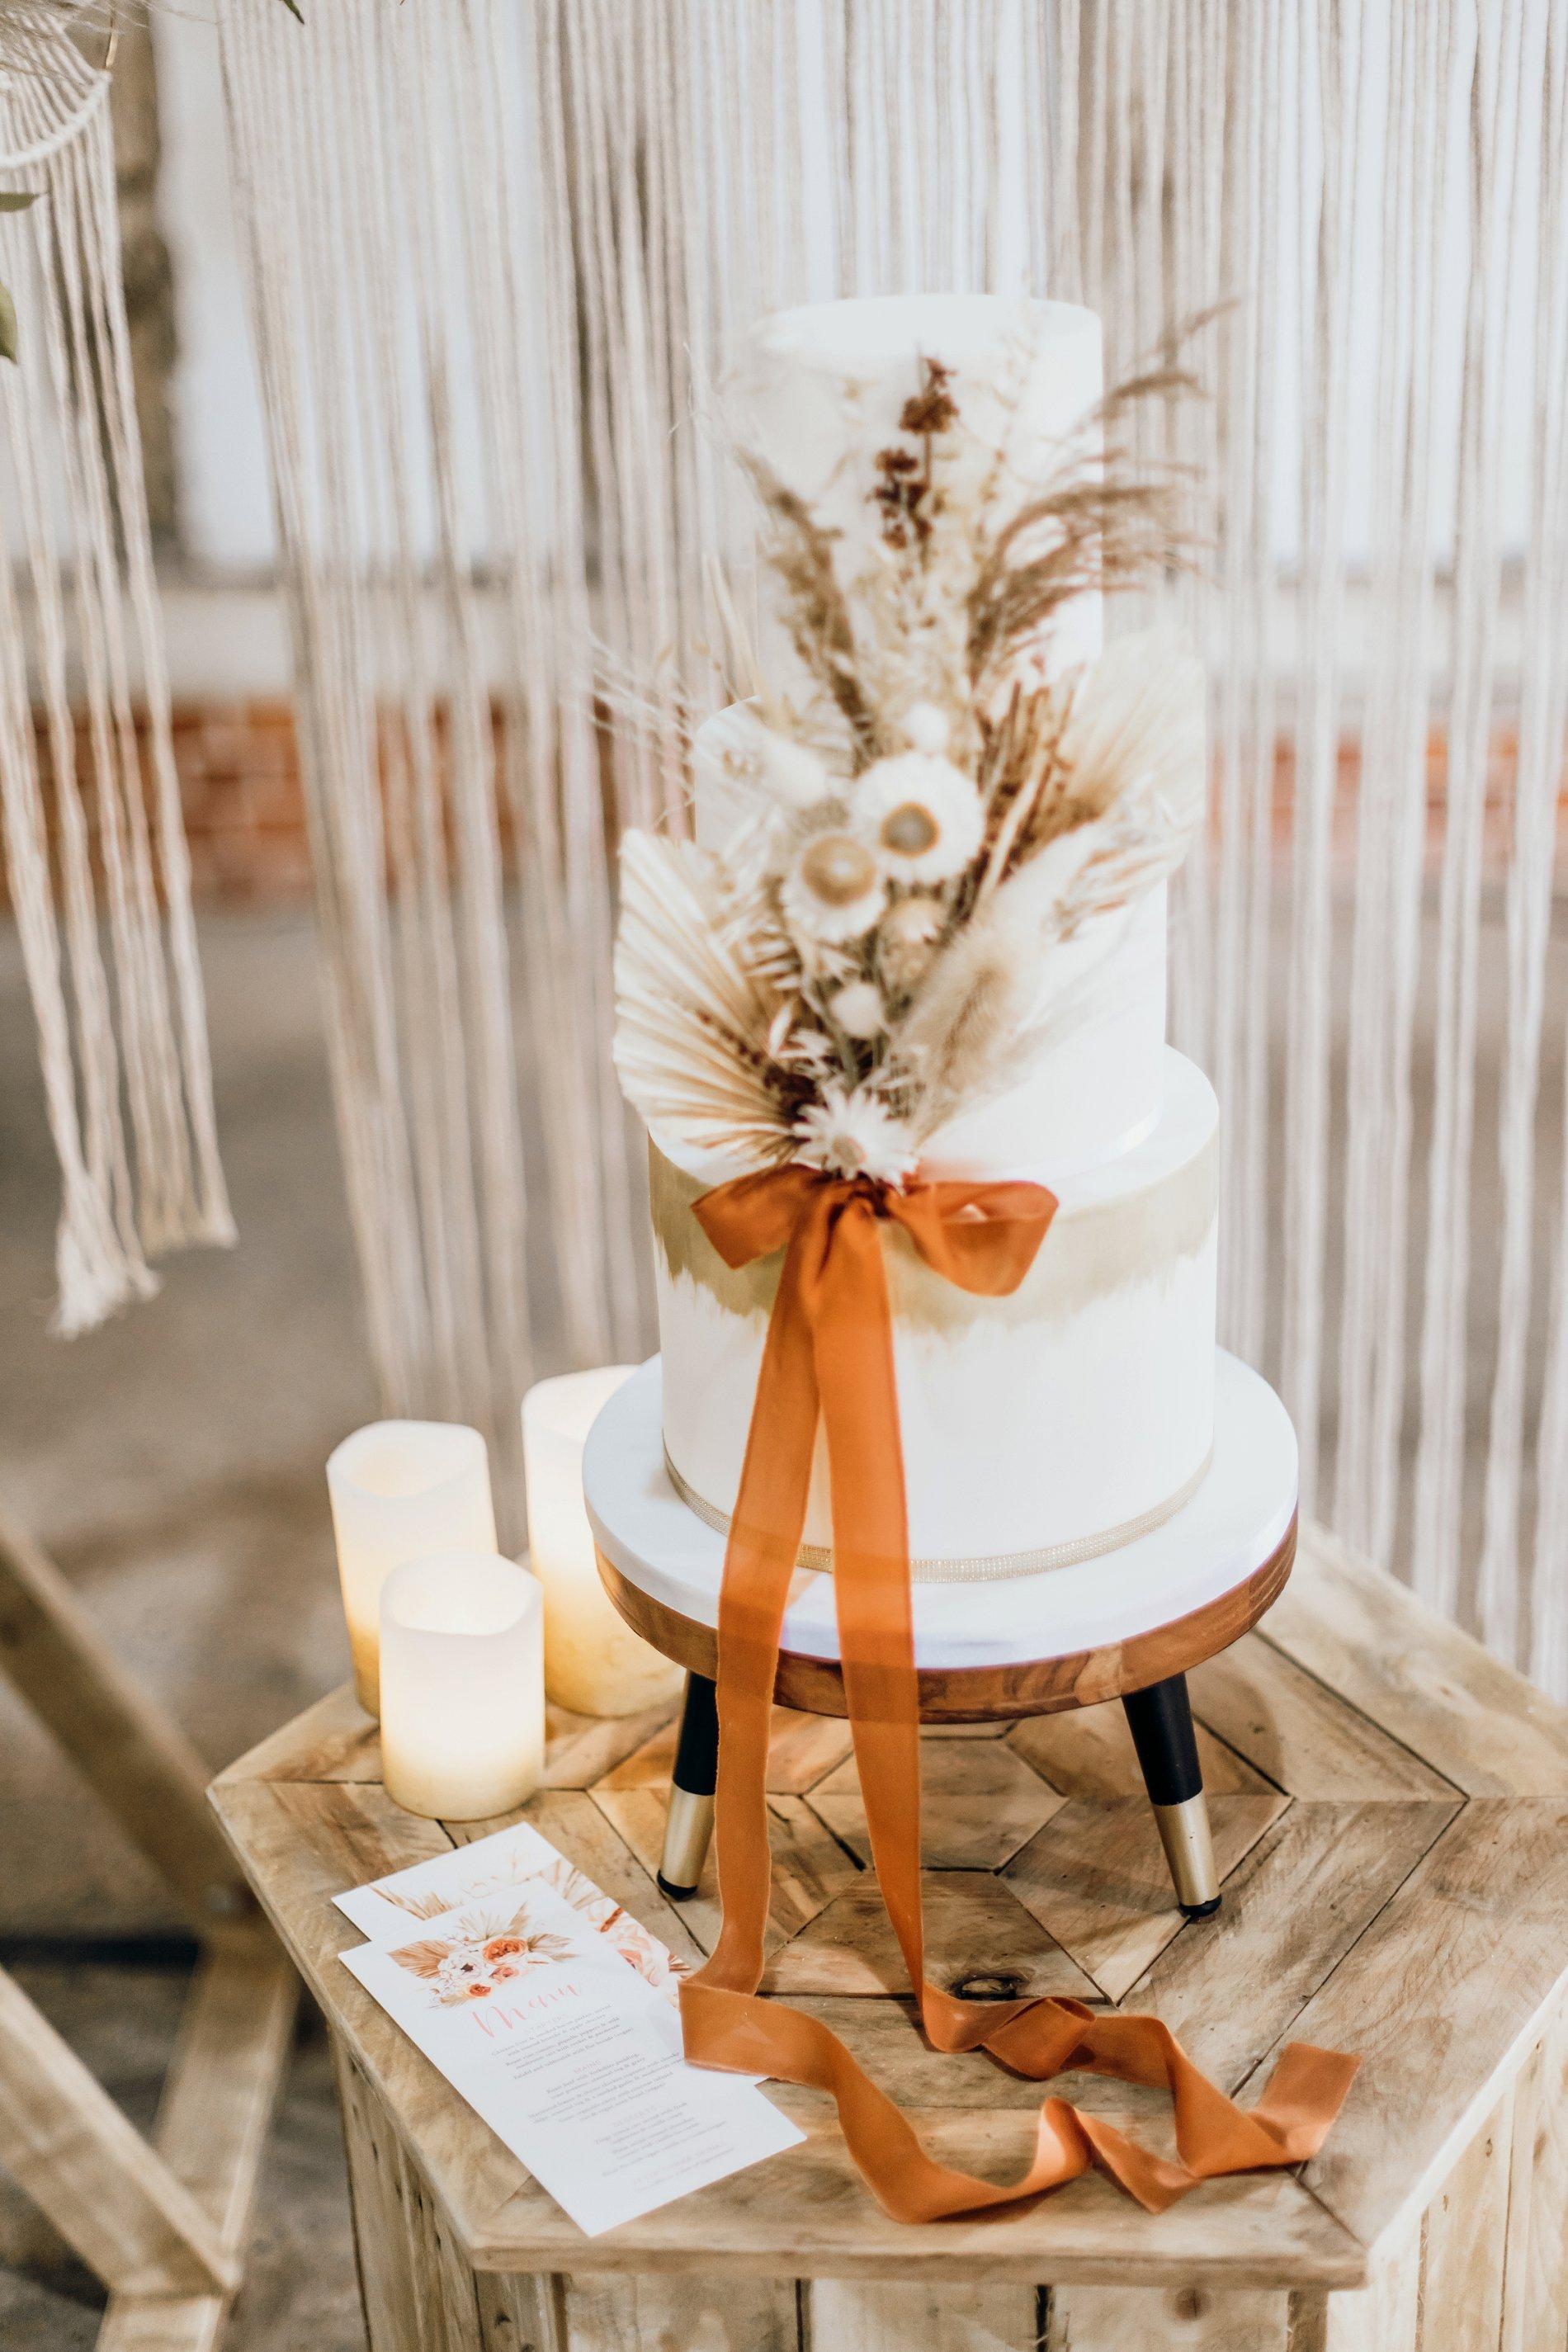 A Golden Boho Wedding Shoot at Cressing Temple Barns (c) Kate Boston Photography (25)